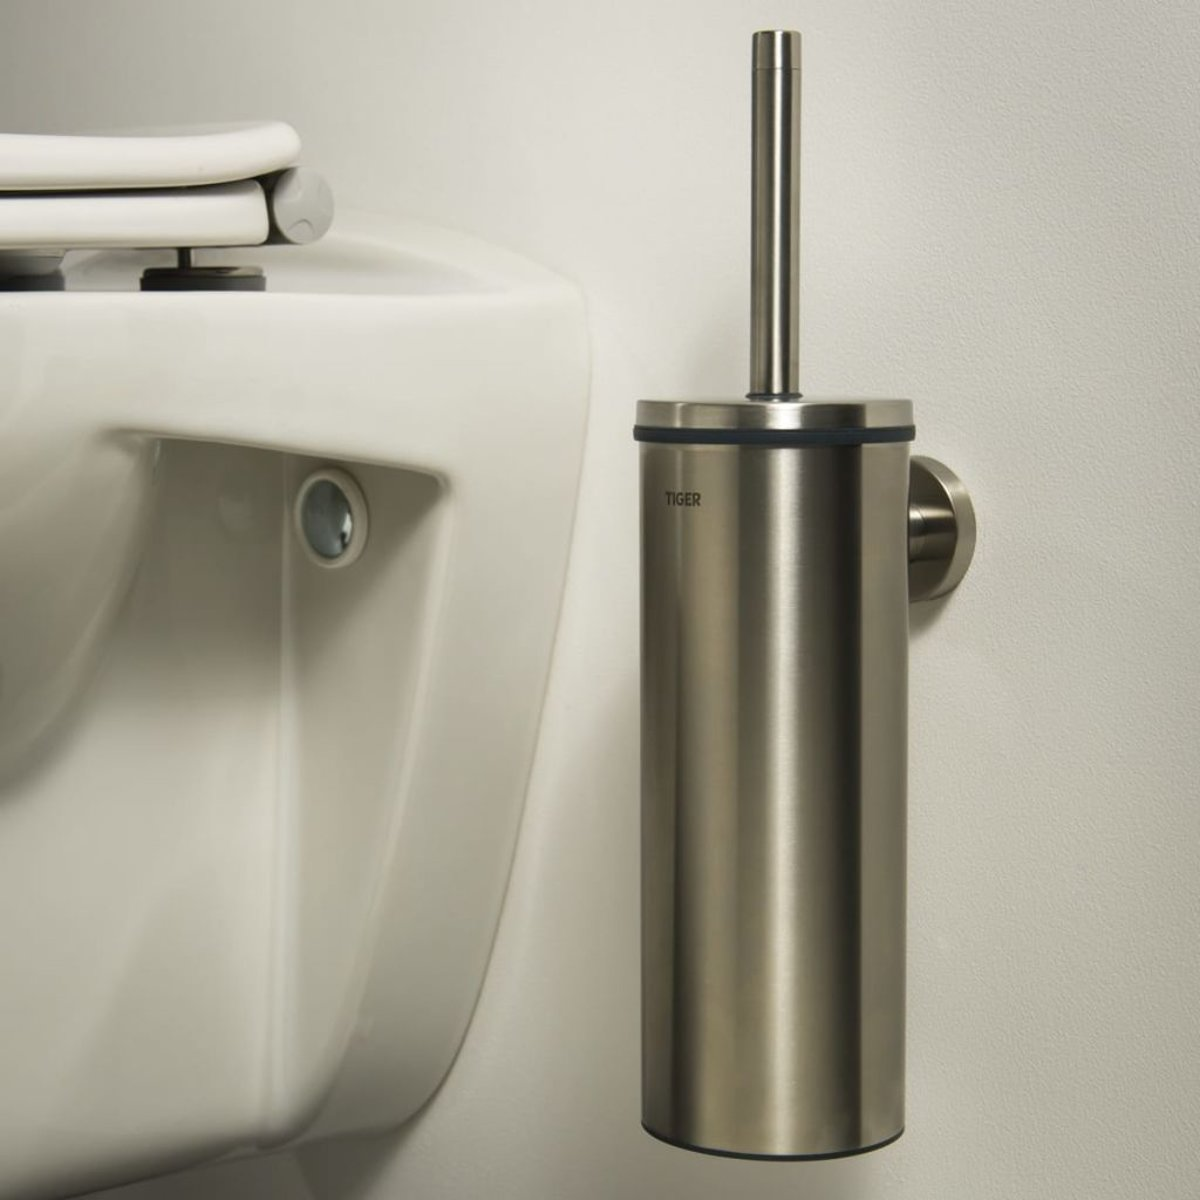 Genoeg bol.com   Tiger Boston Toiletborstel met houder - RVS Geborsteld DR25